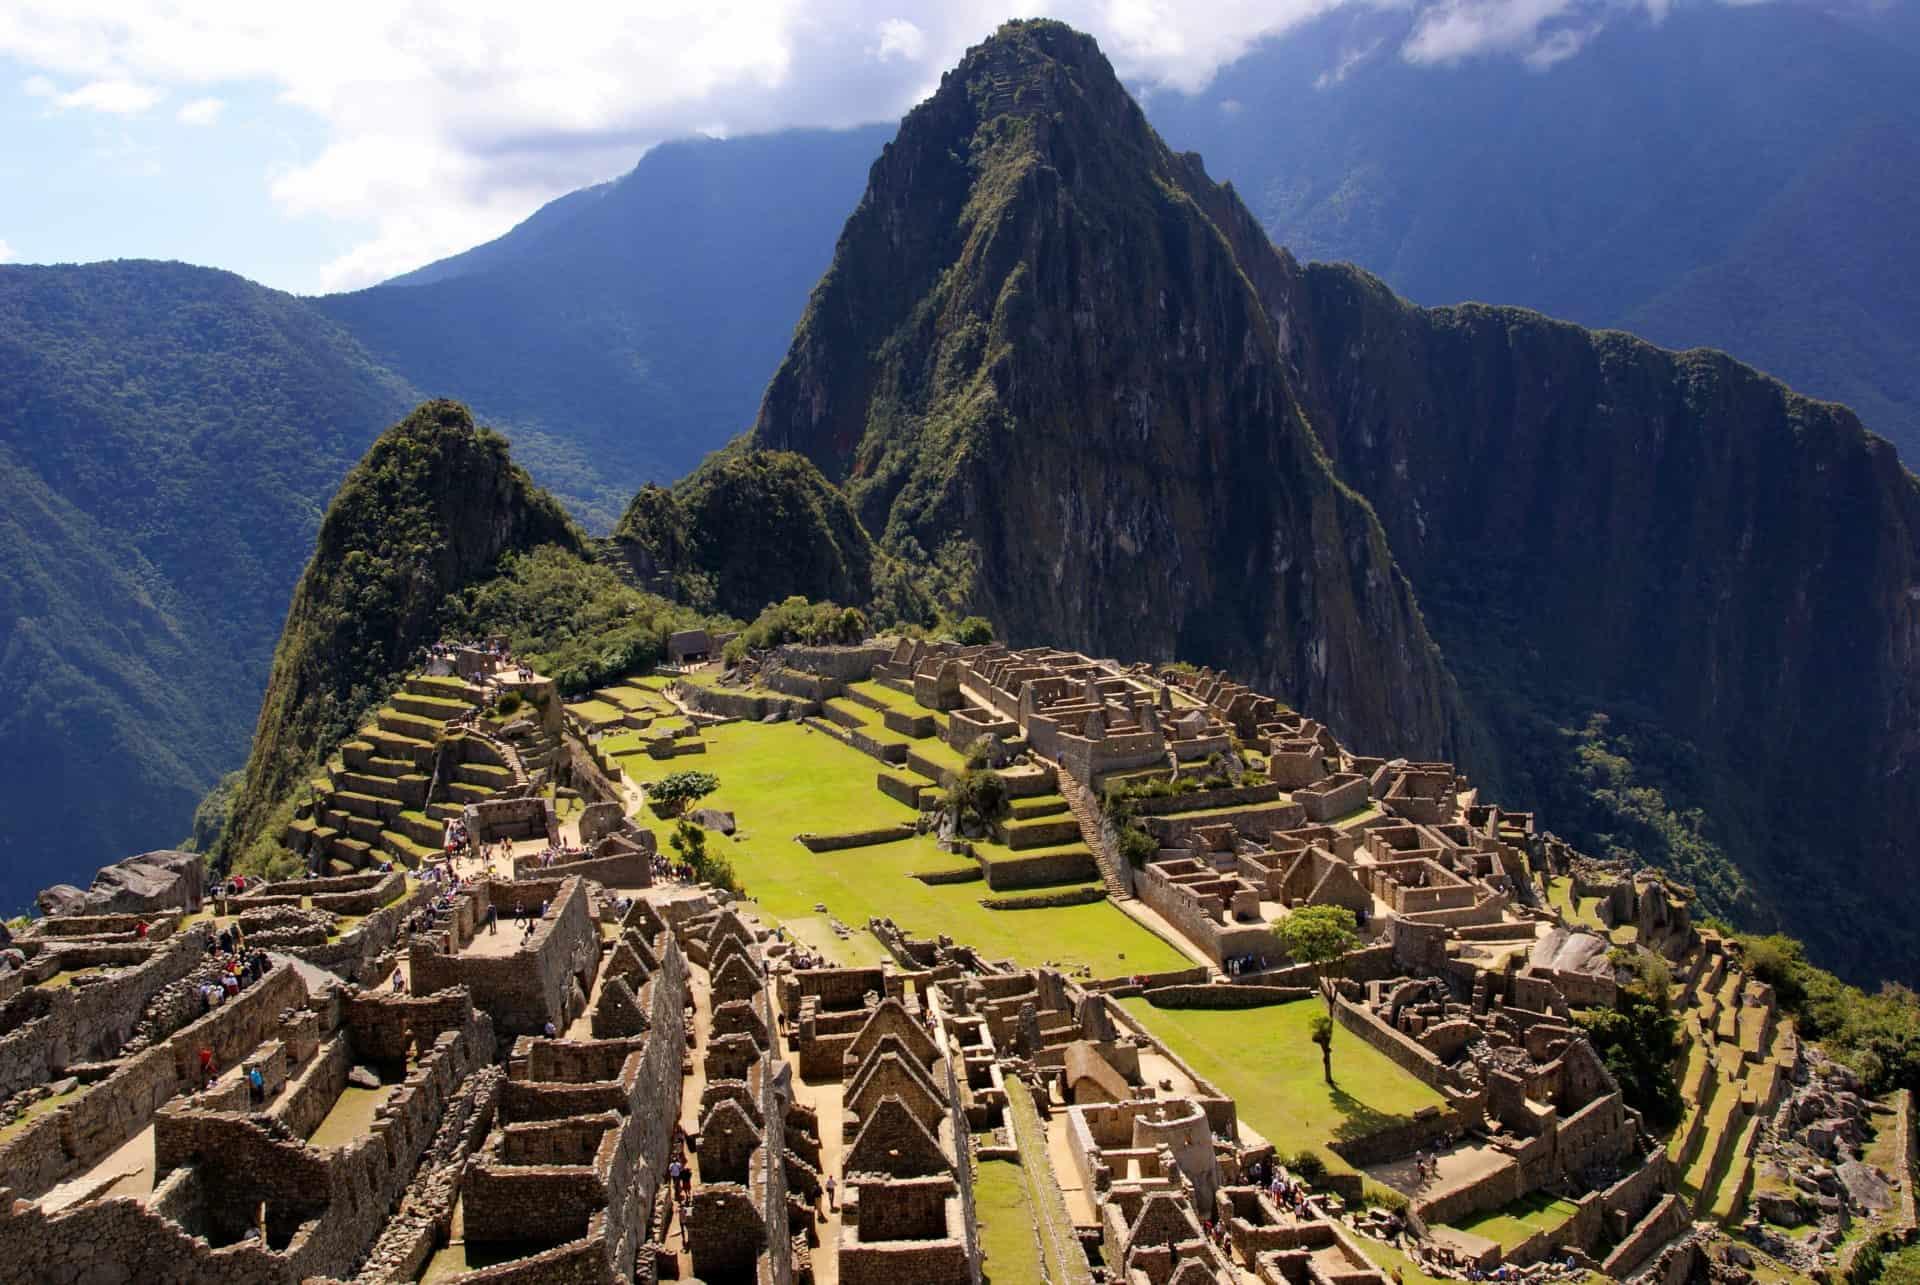 Salkantay – The lesser known but more enjoyable trek to Machu Picchu